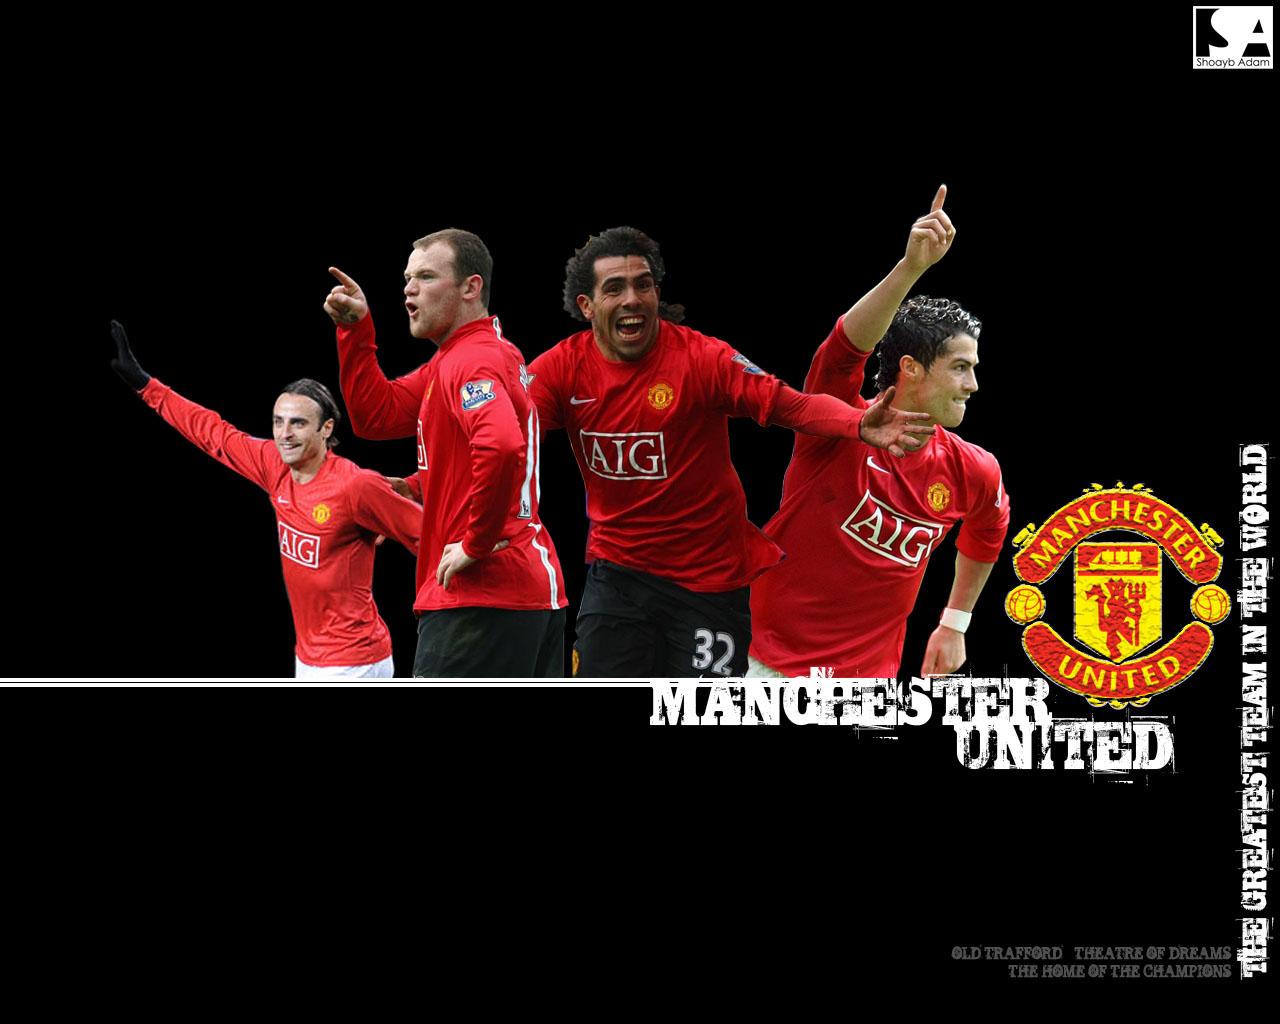 http://3.bp.blogspot.com/-XRiL0Uon4cE/TfCBU2SAzYI/AAAAAAAAAEA/e6xxBRyOjTg/s1600/Manchester+United+Wallpaper+3.jpg